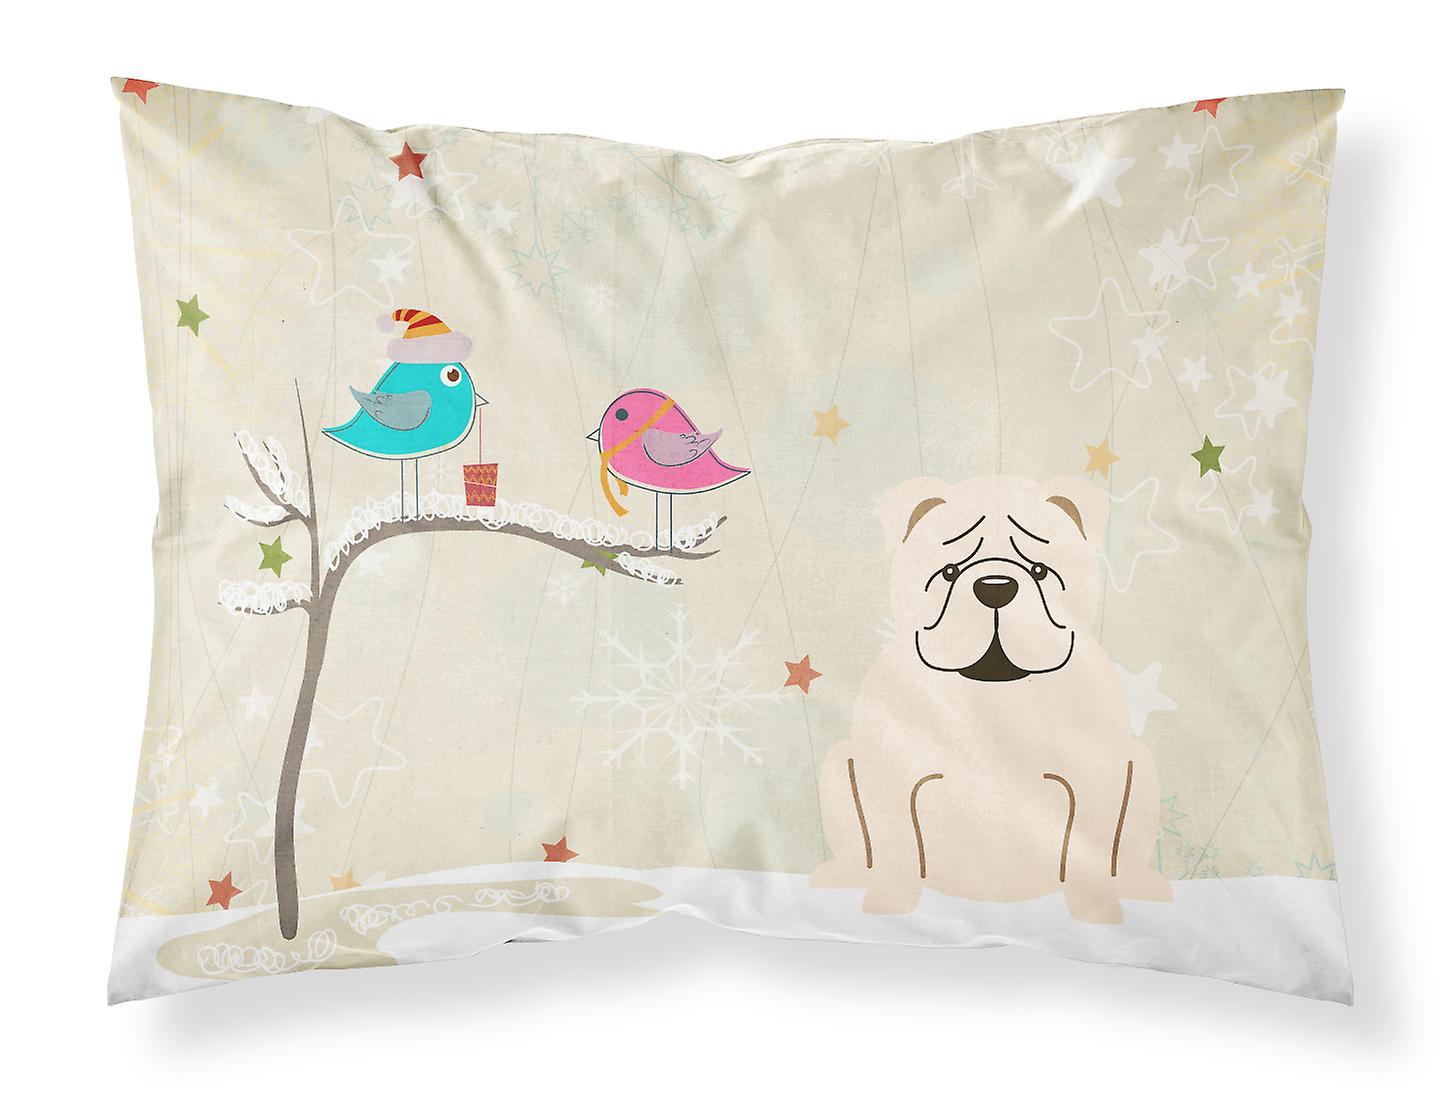 Tissu Noël Standard Cadeaux Amis De Blanc Entre Bulldog Pillowc Anglais CoerxBQdWE